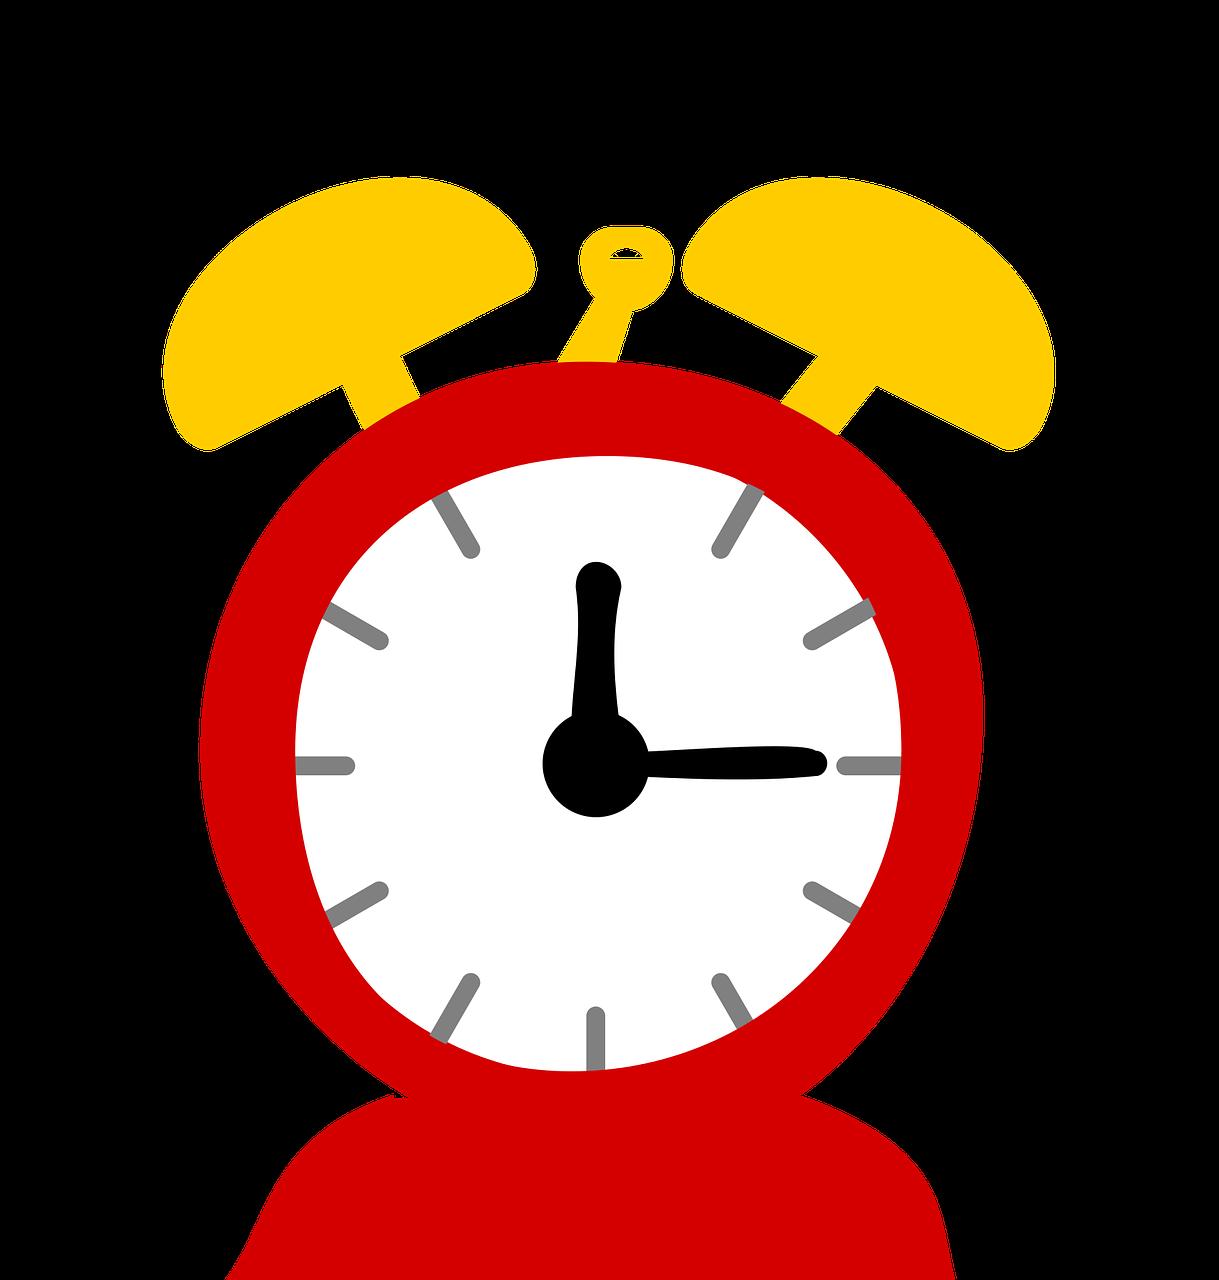 Alarm grace lutheran church. Patience clipart clock